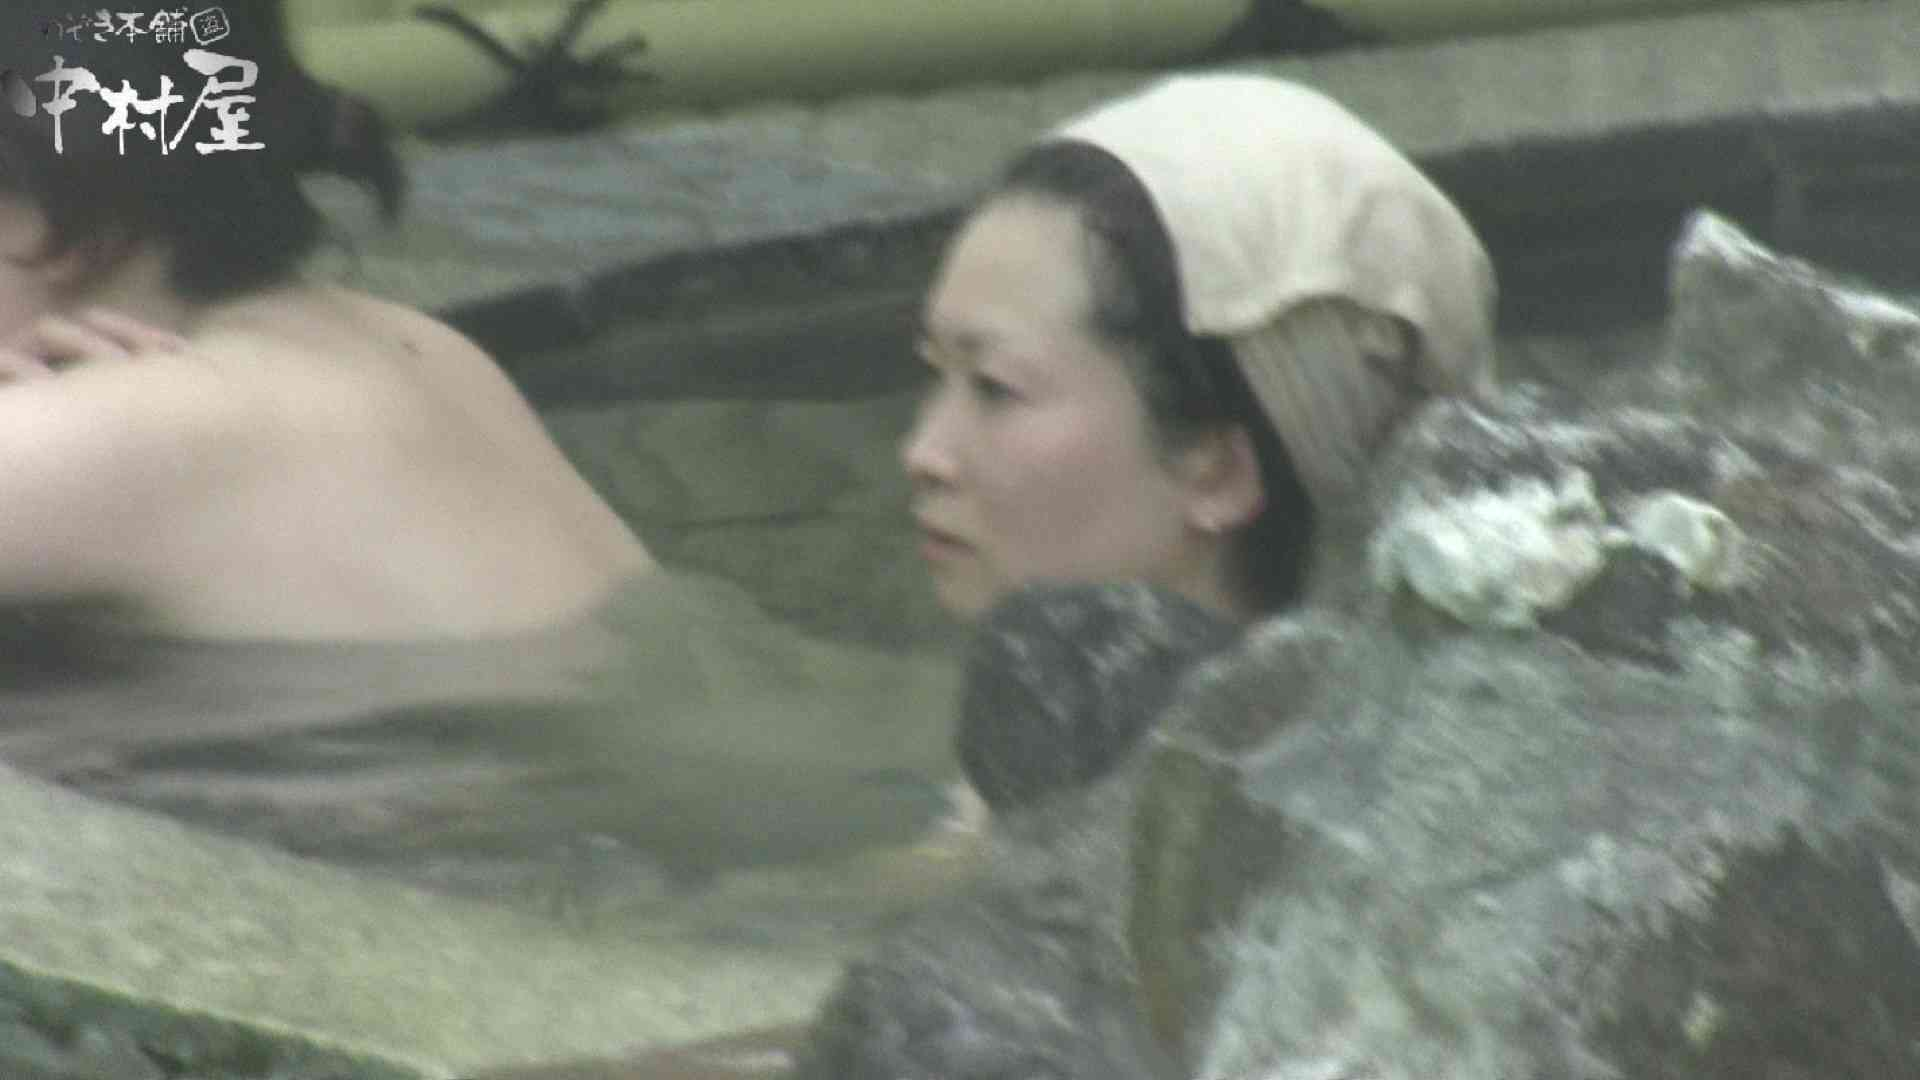 Aquaな露天風呂Vol.906 露天風呂編  86PIX 70